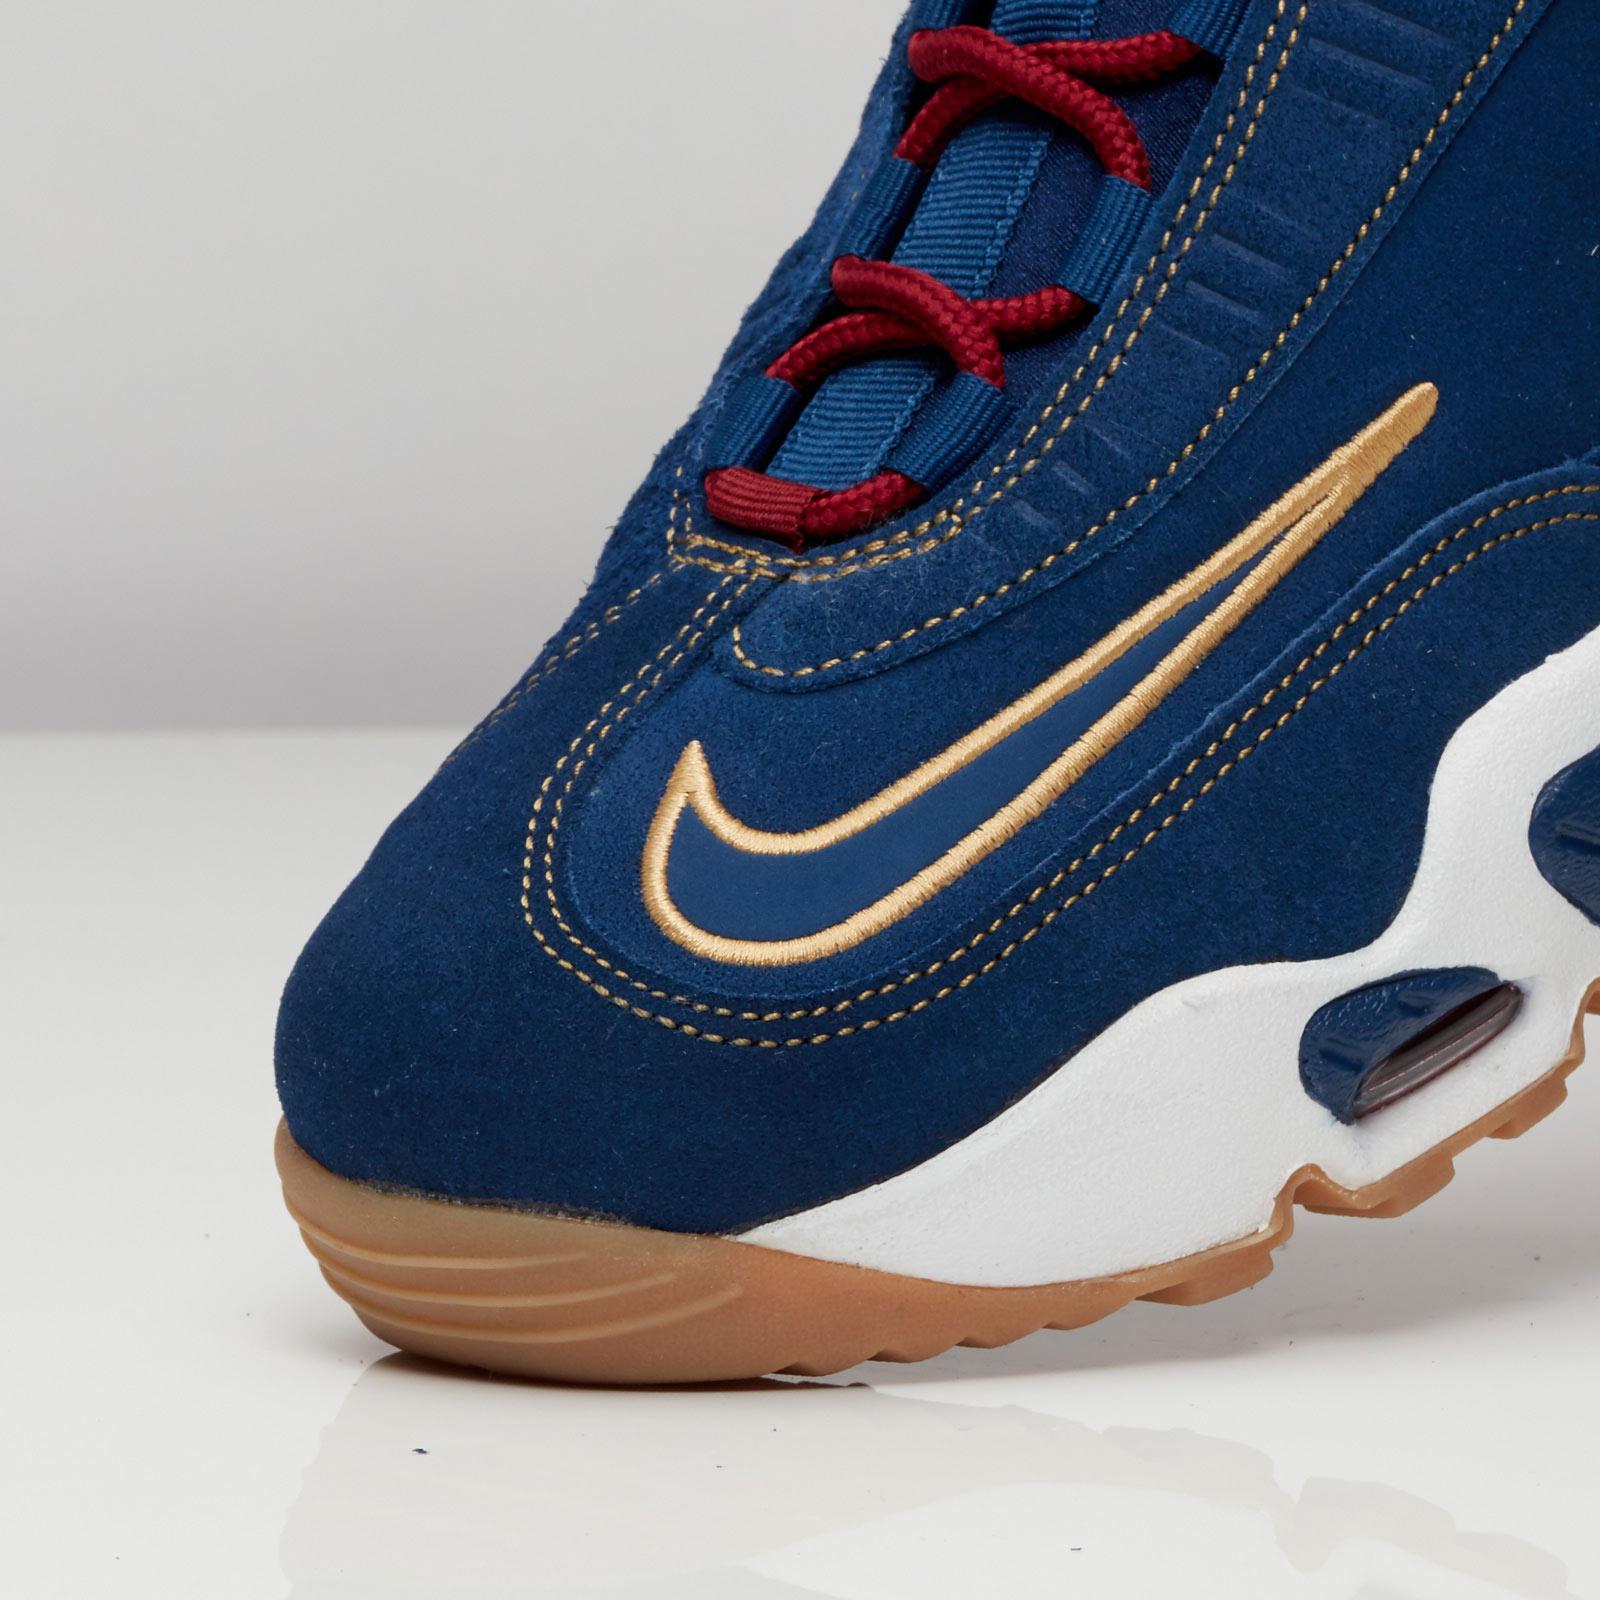 Nike Air Griffey Max 1 Prez QS 853014 400 Sneakersnstuff